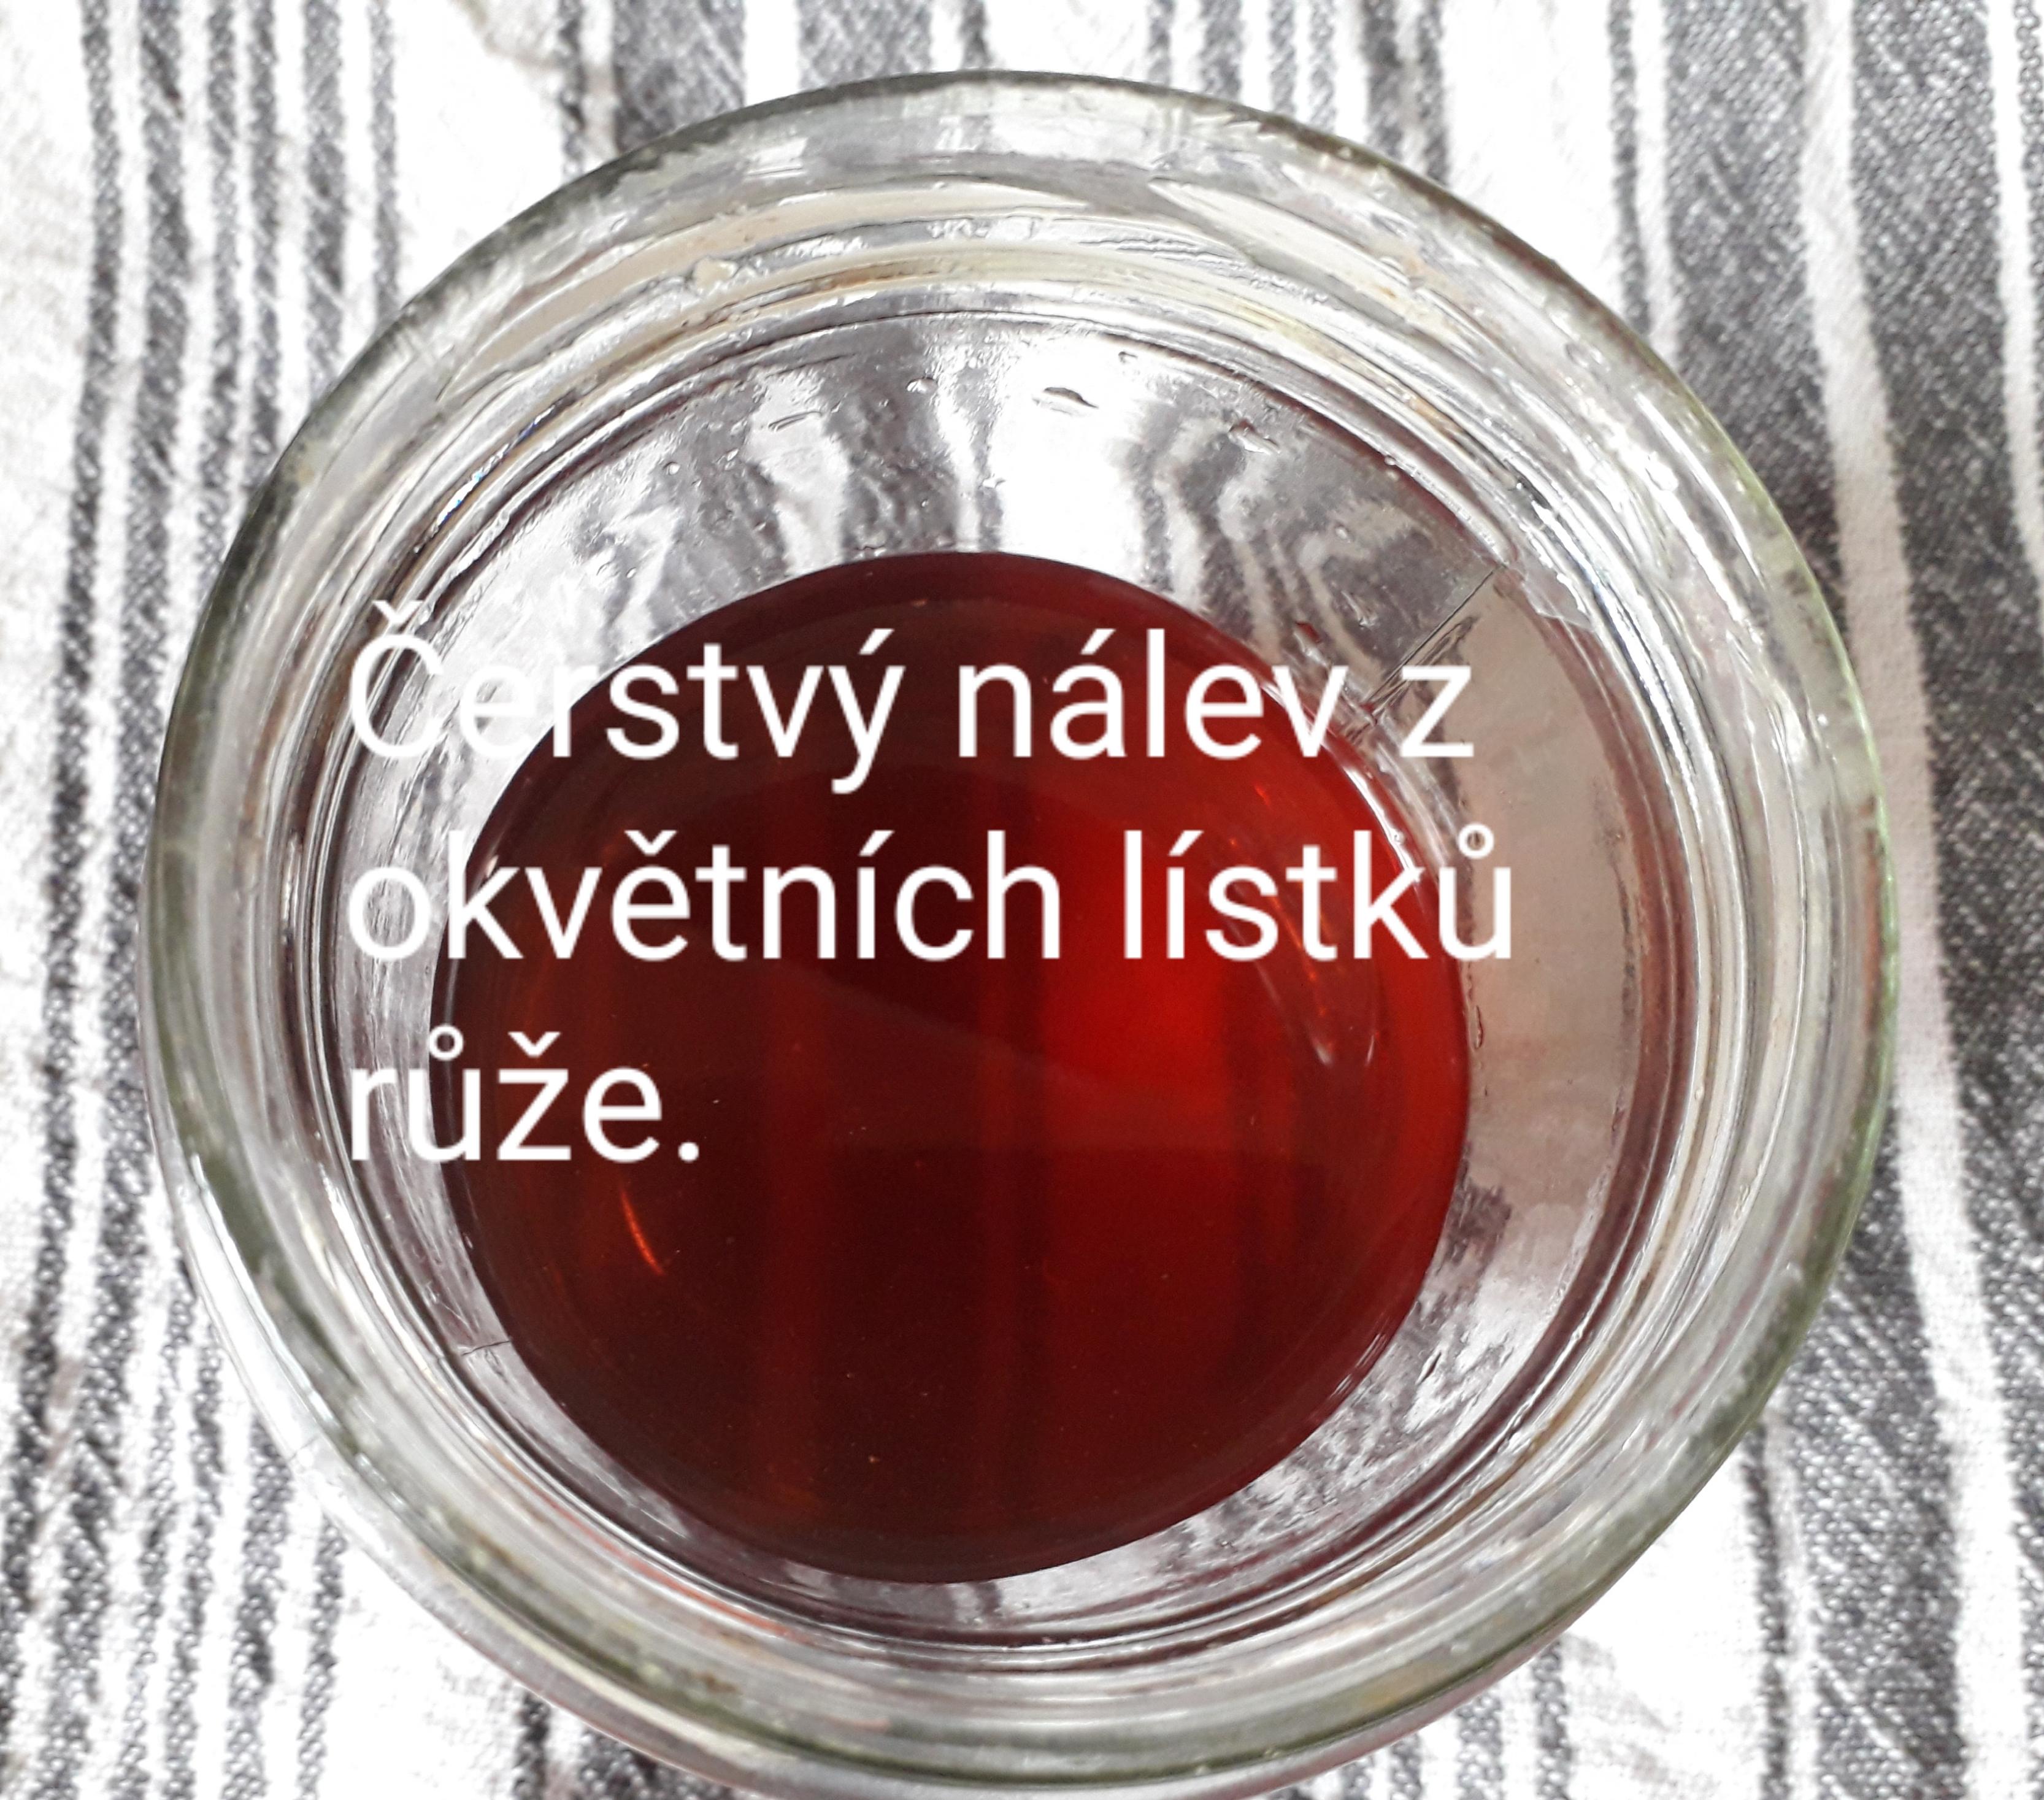 20190502_184426